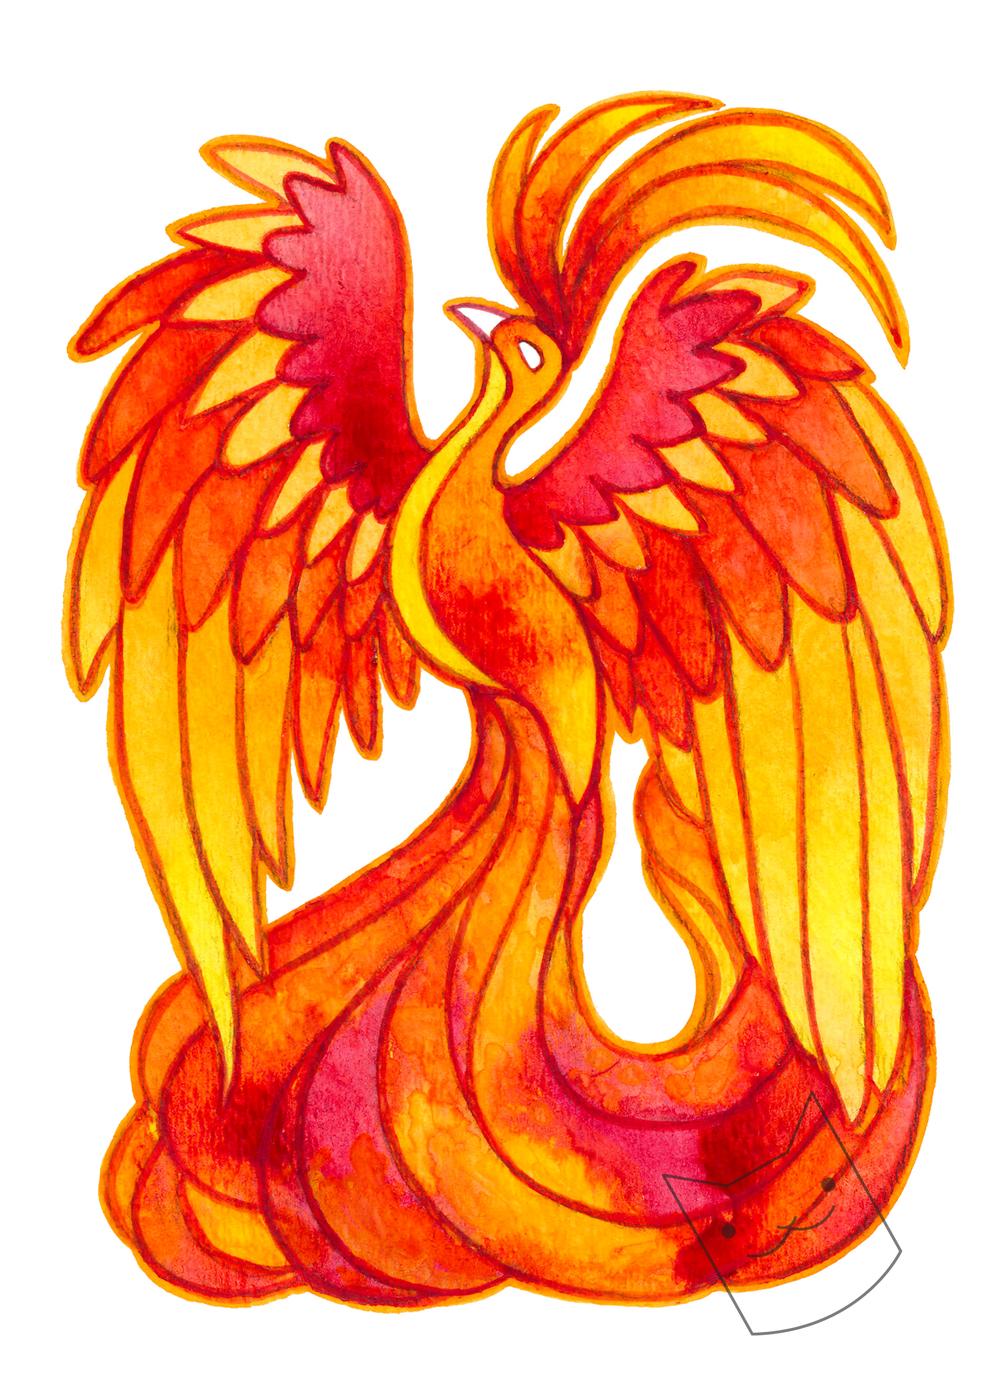 phoenix watermark.jpg